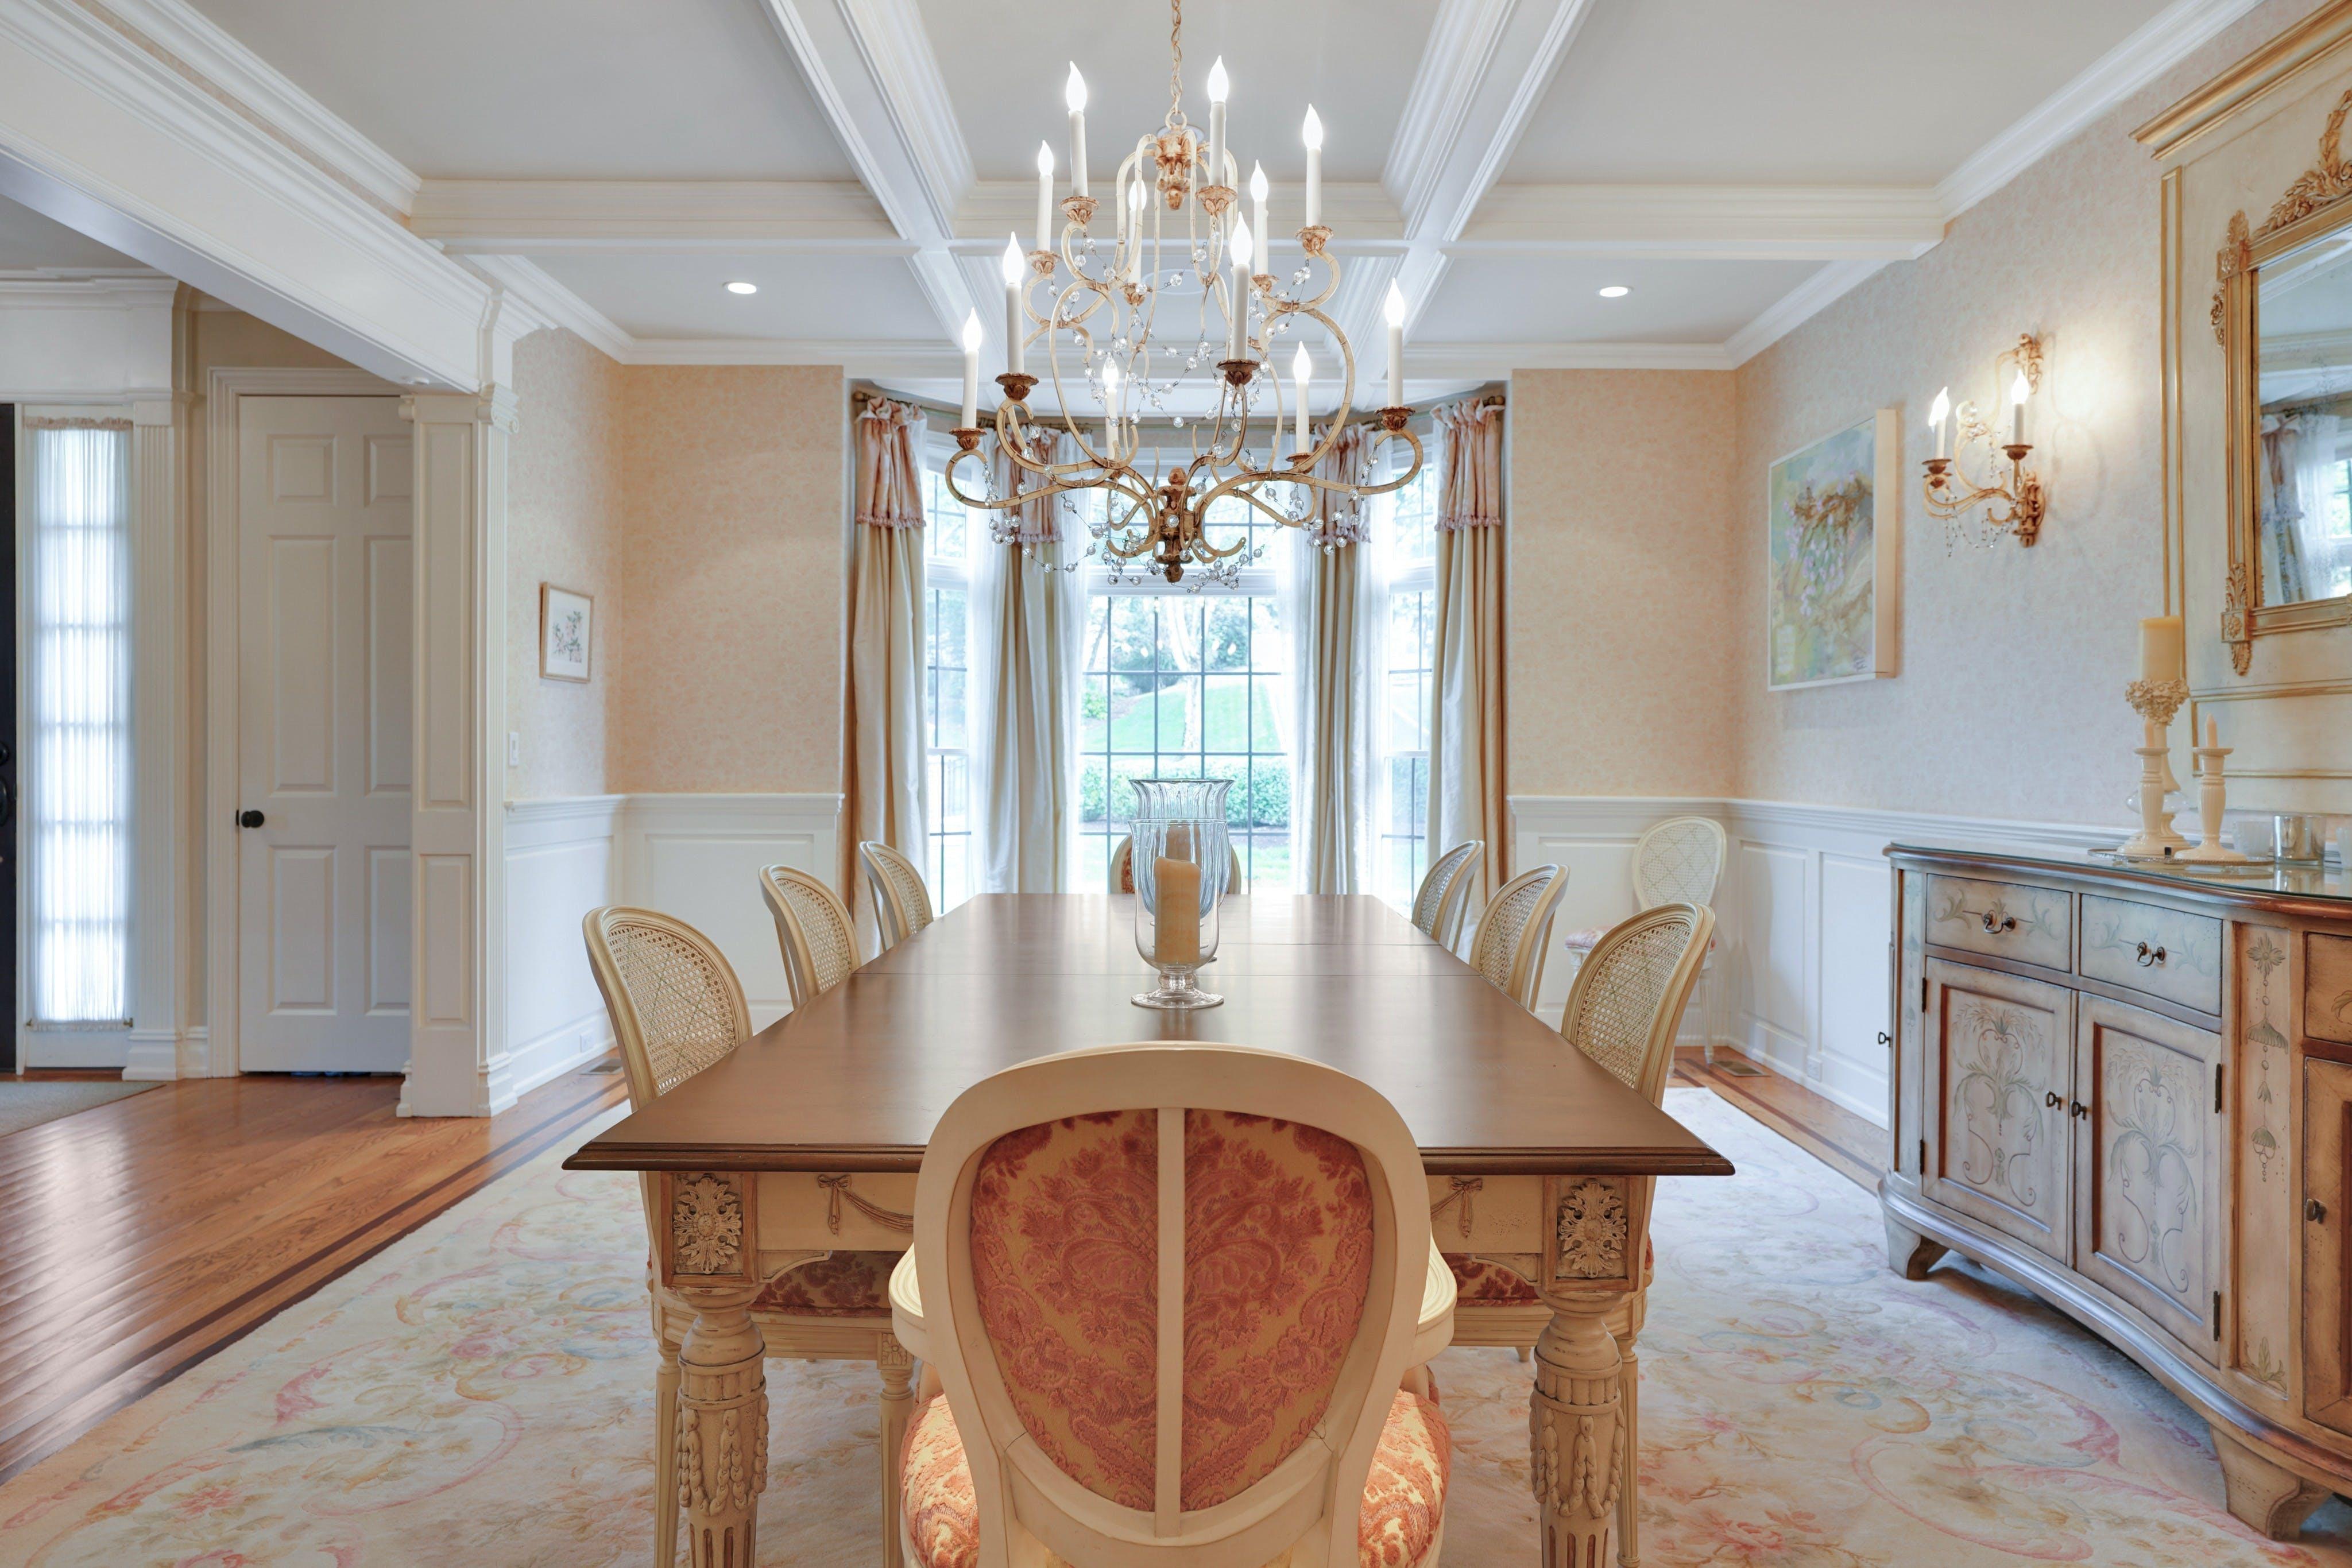 21 Saratoga Dining Room